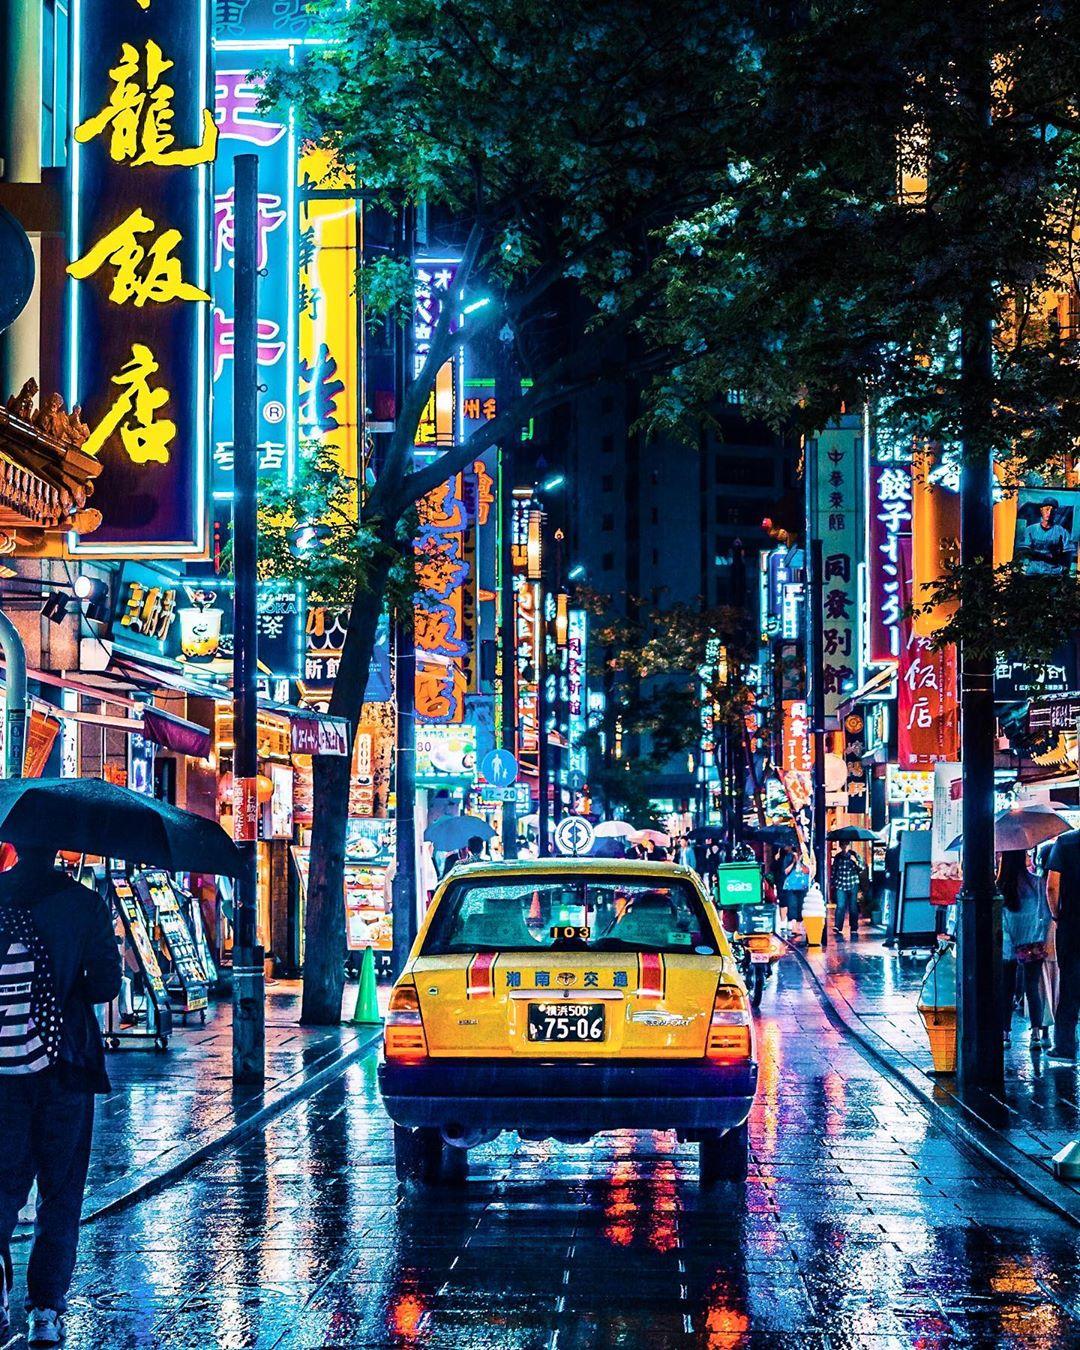 tokyo-nightlife-photography-hosokawa-ryohei-8